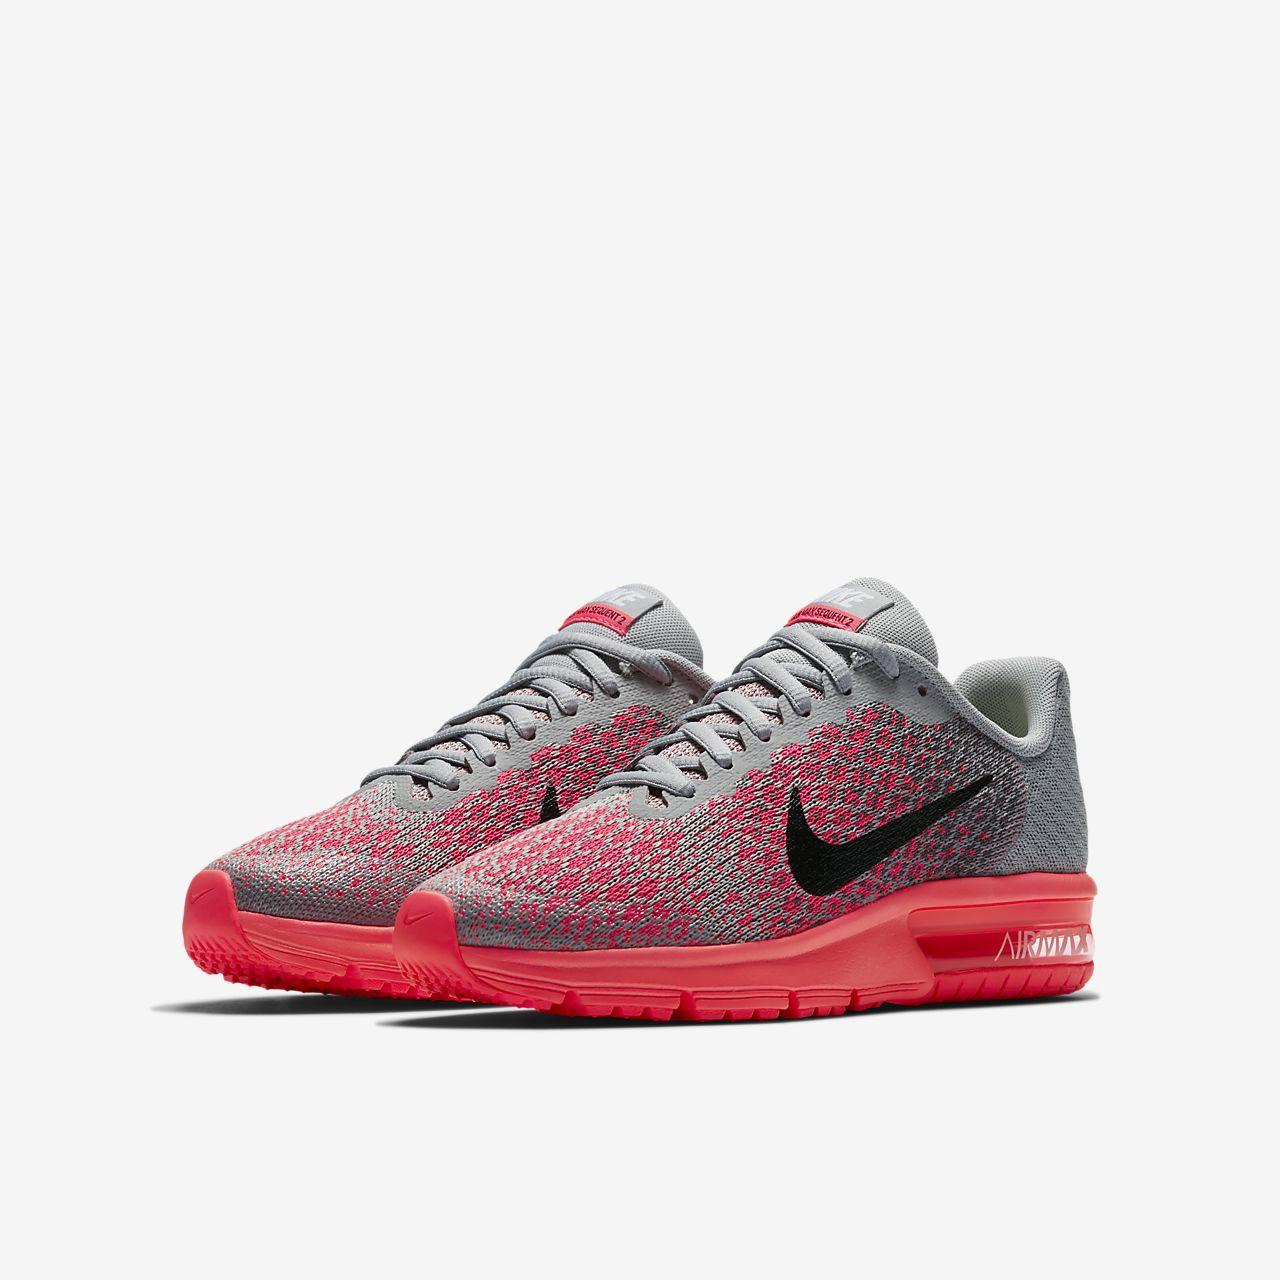 f9ca4a48327c Nike Air Max Sequent 2 Older Kids  Running Shoe. Nike.com GB